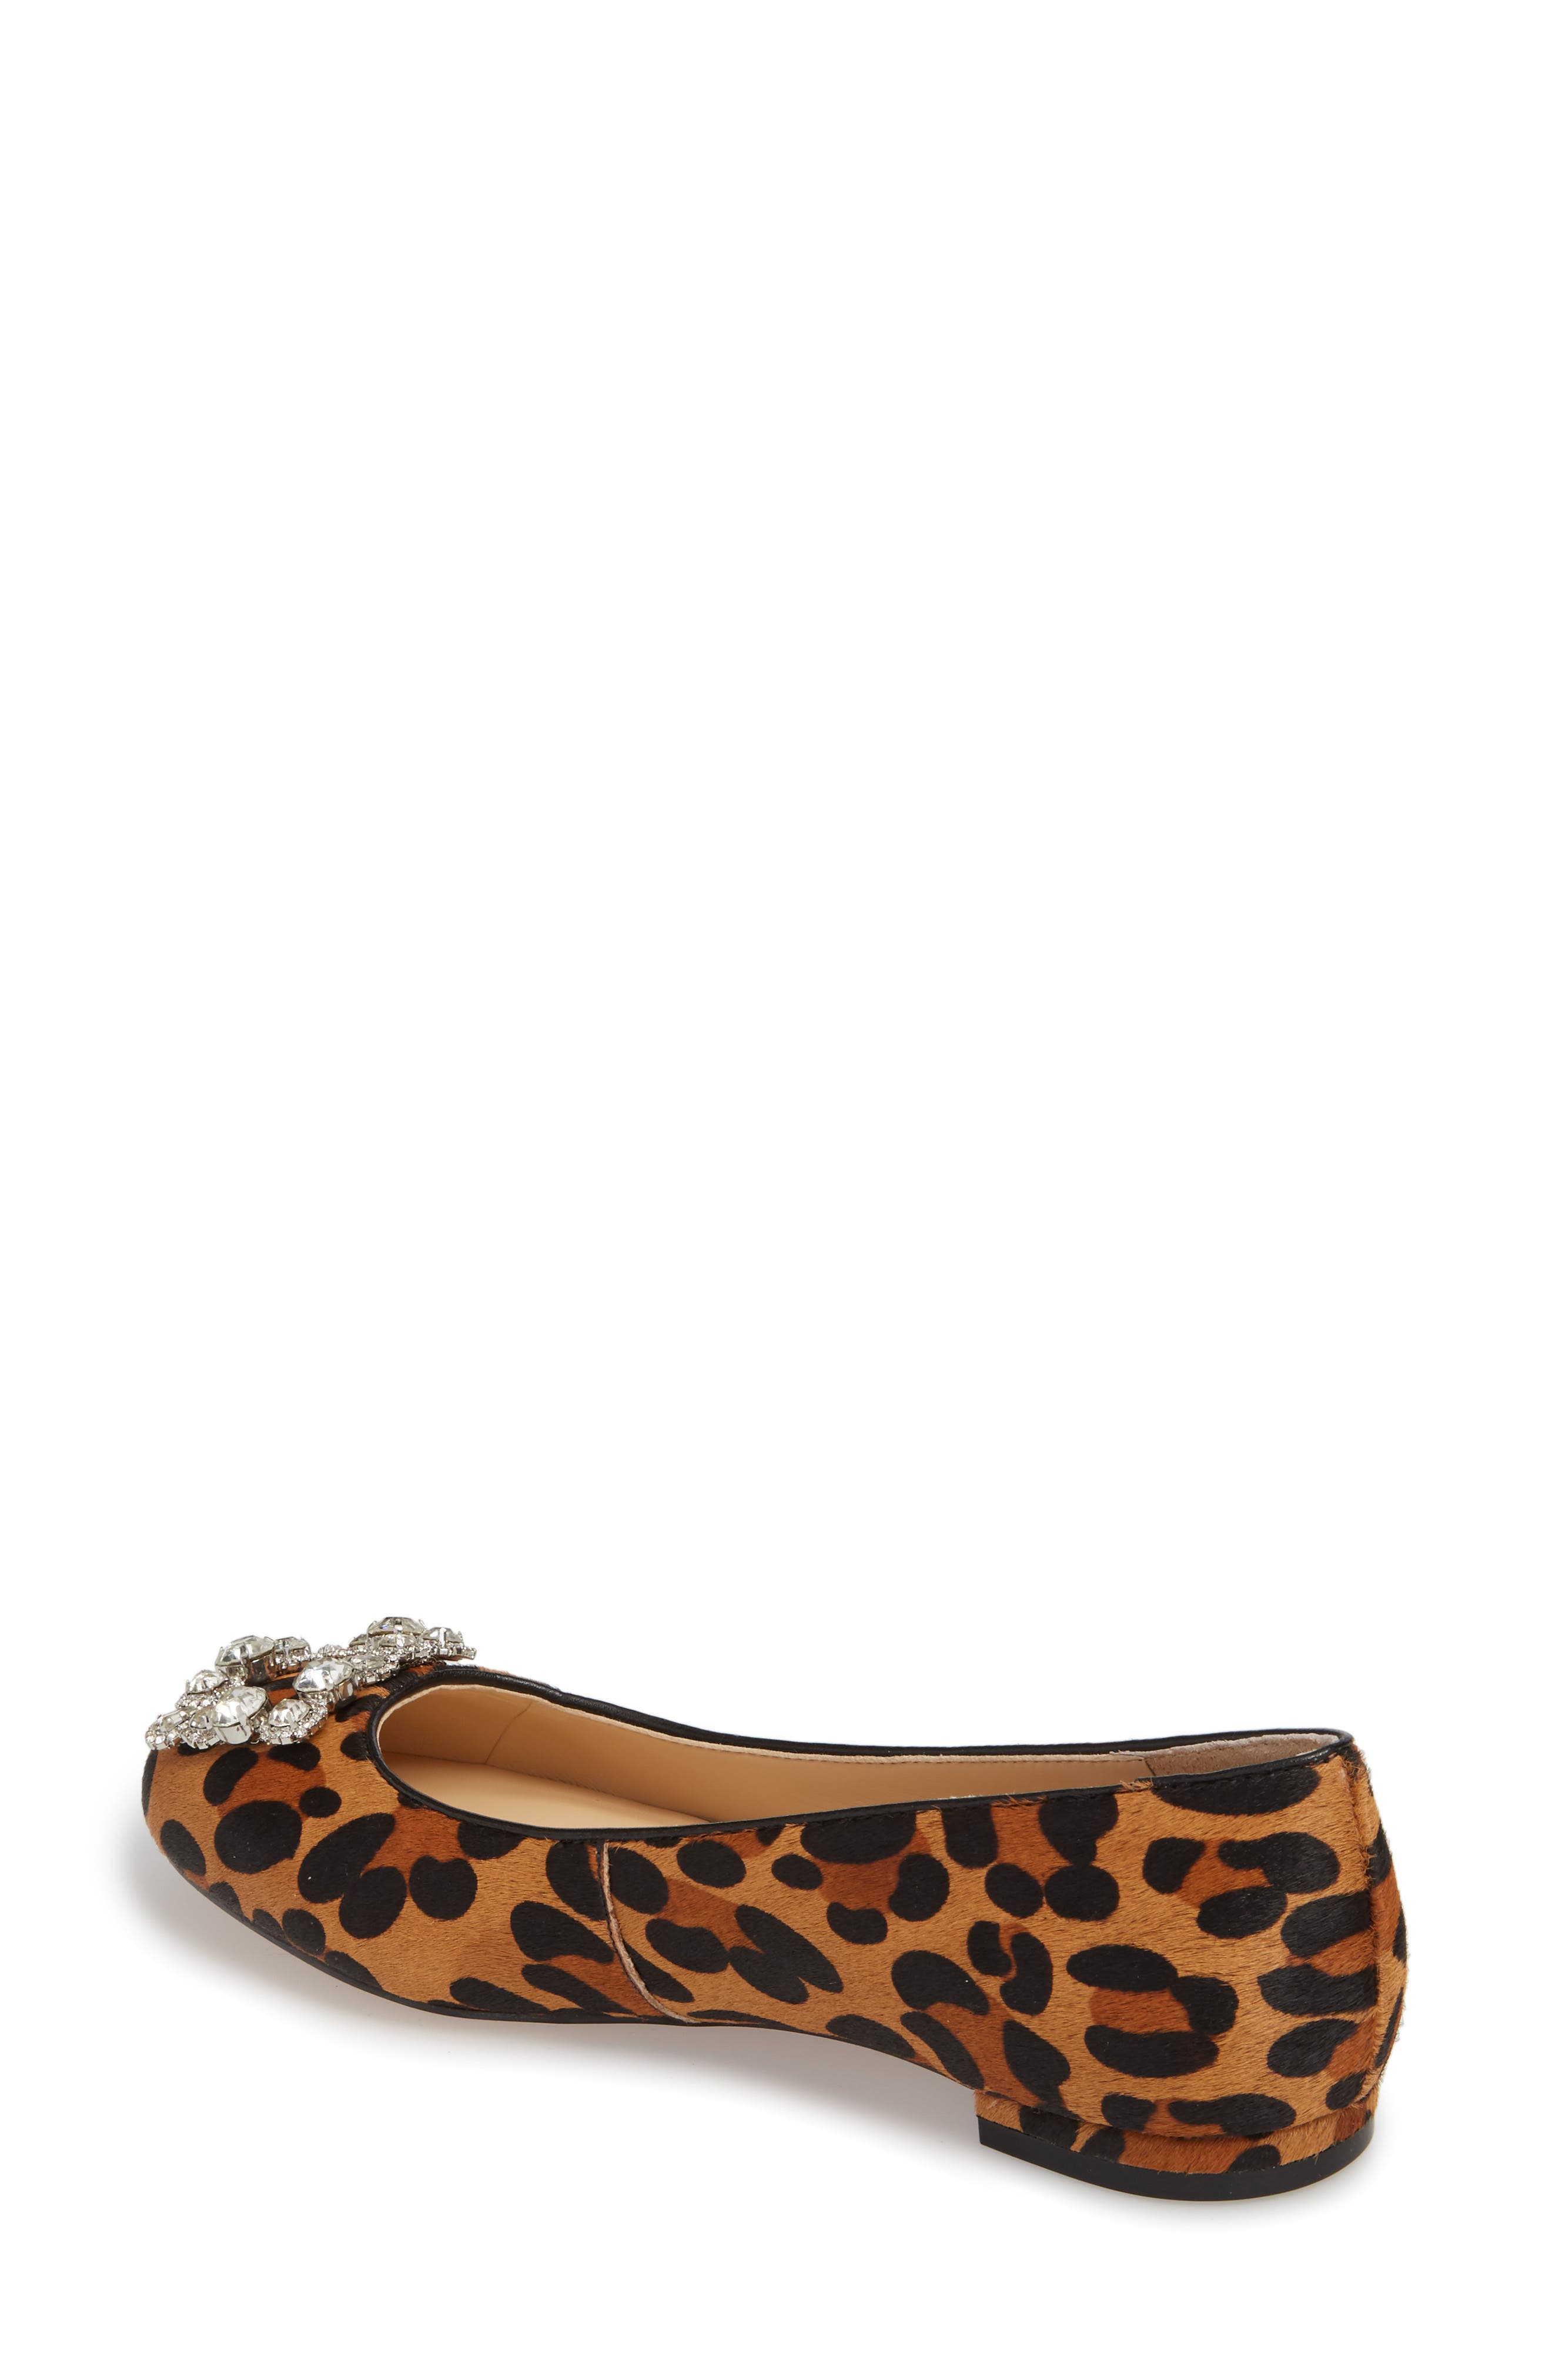 Pamella Ballet Flat,                             Alternate thumbnail 2, color,                             Leopard